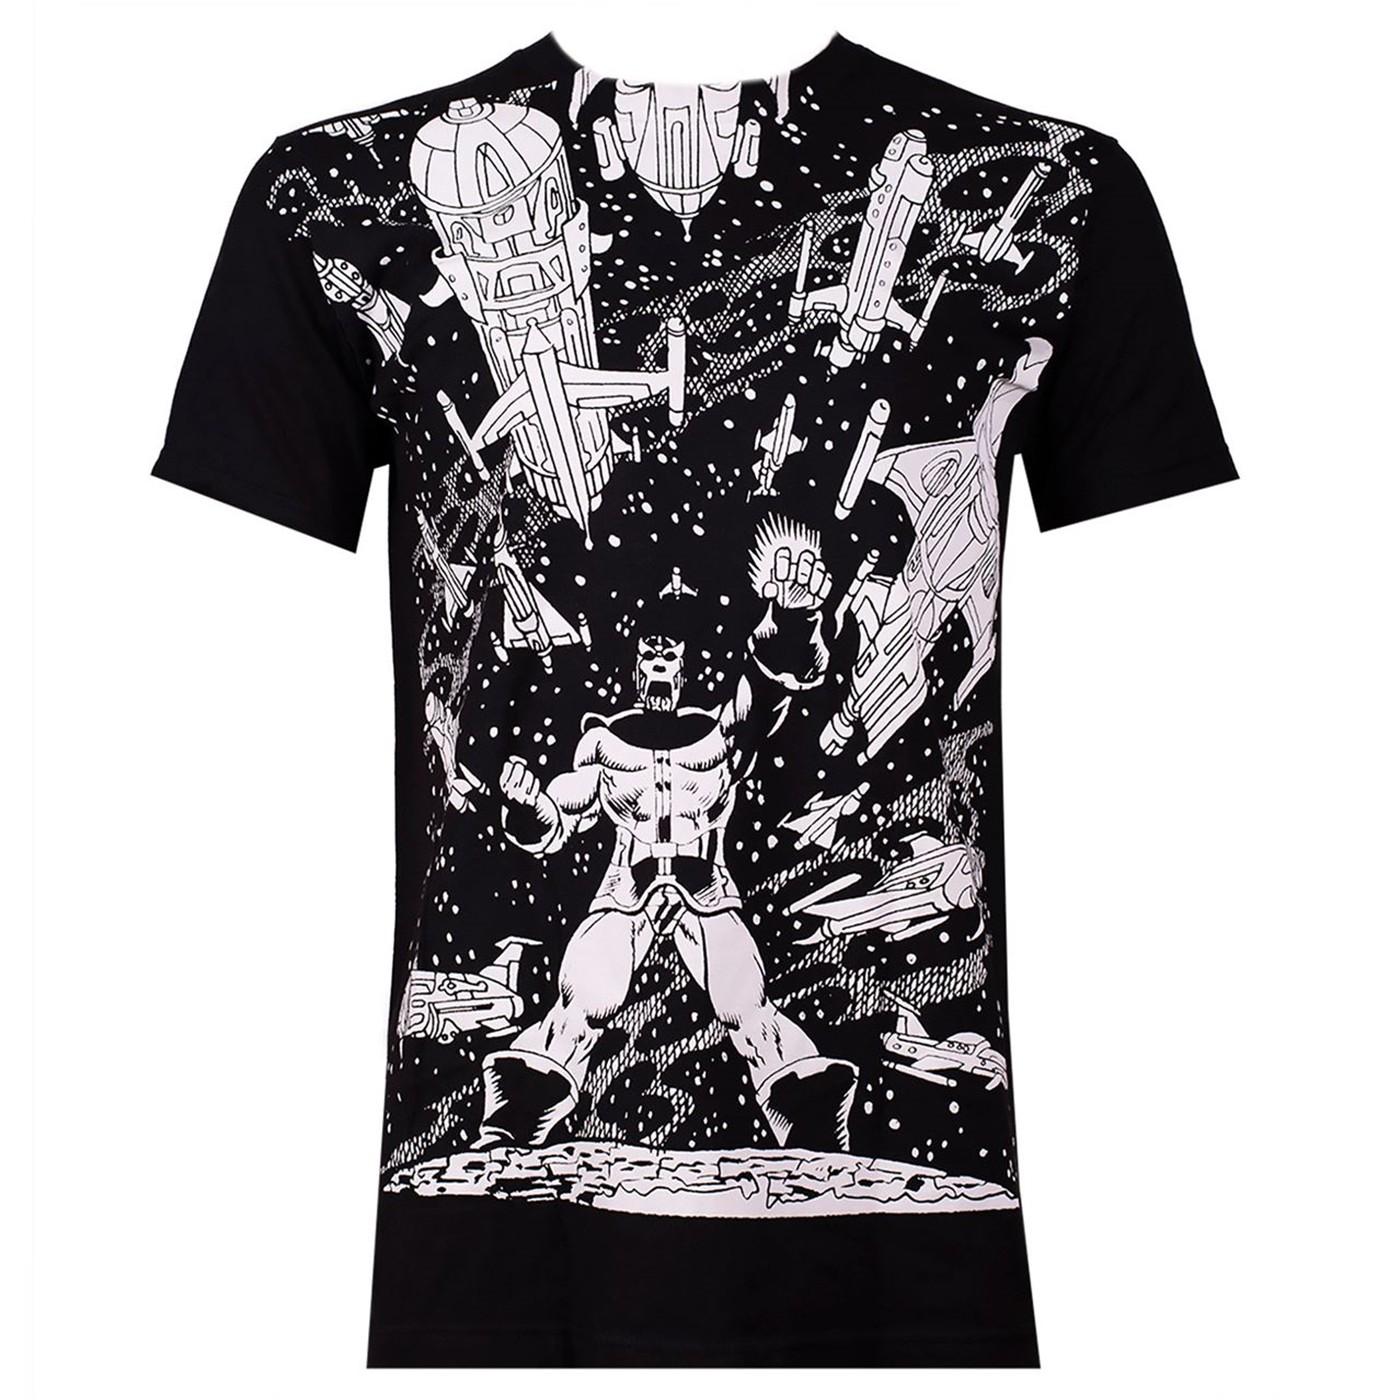 Thanos VS. Spaceships Black Men's T-Shirt